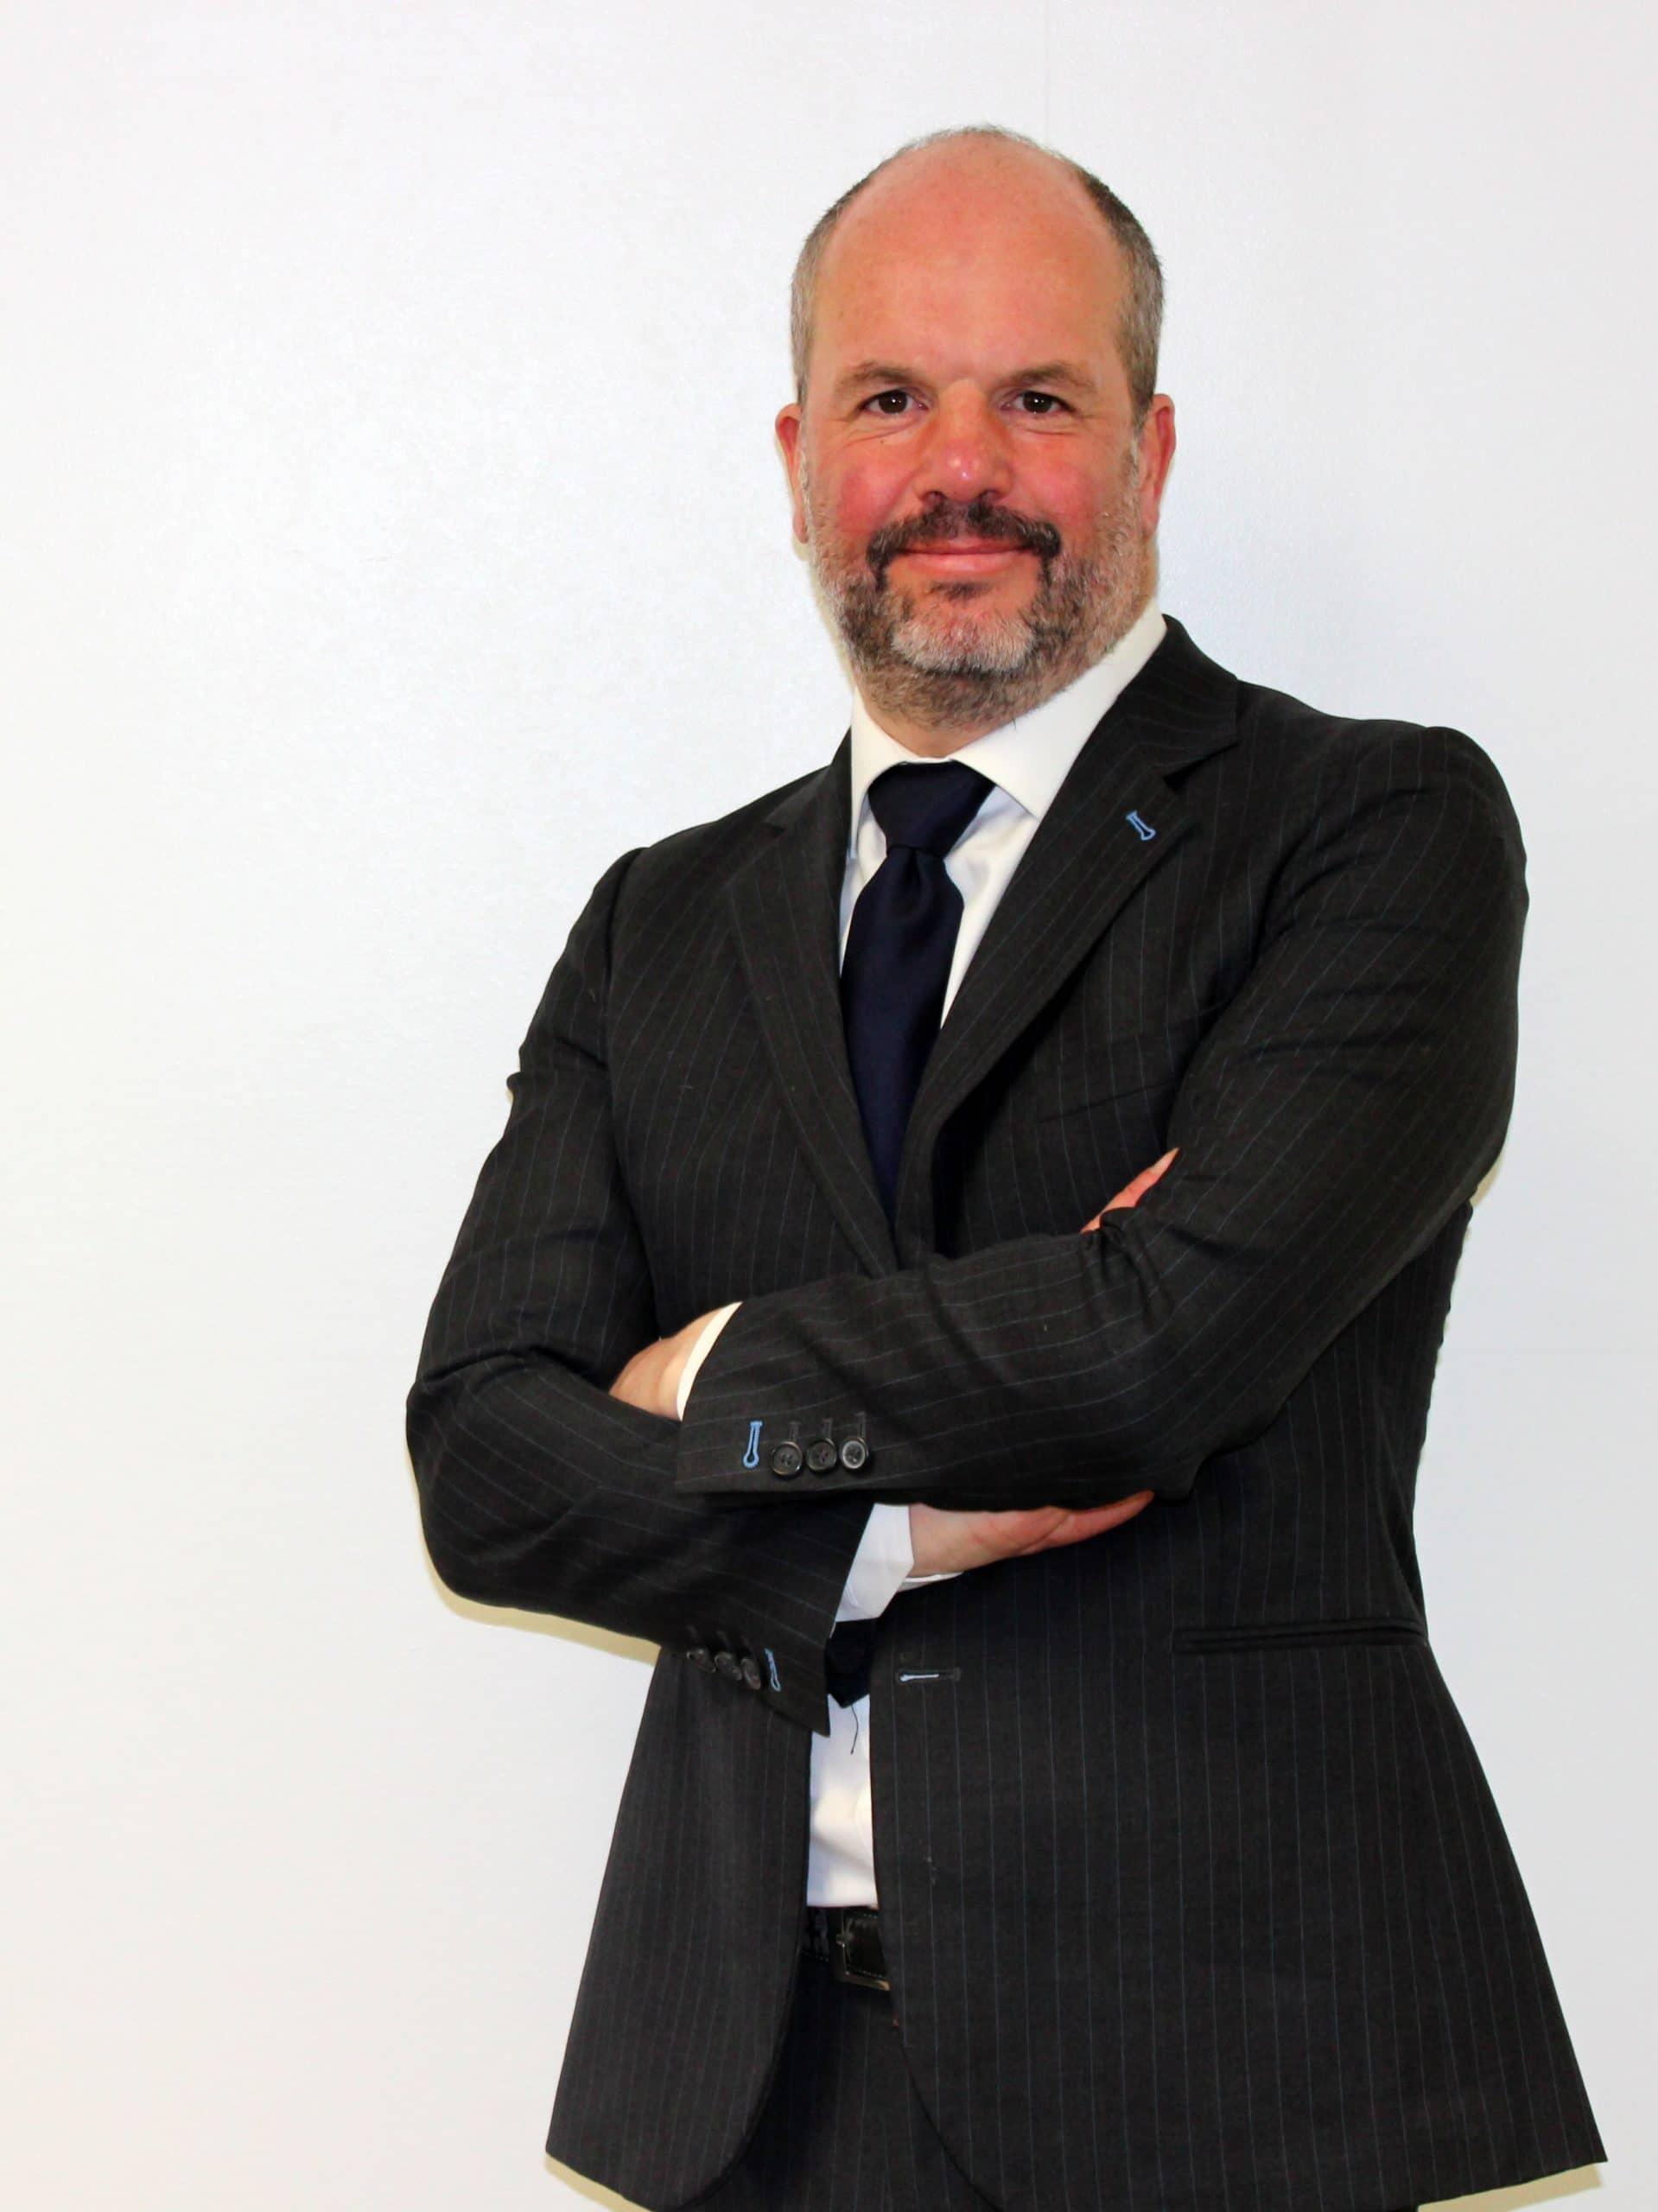 Guillaume de Lonlay - Président de Tailored Finance